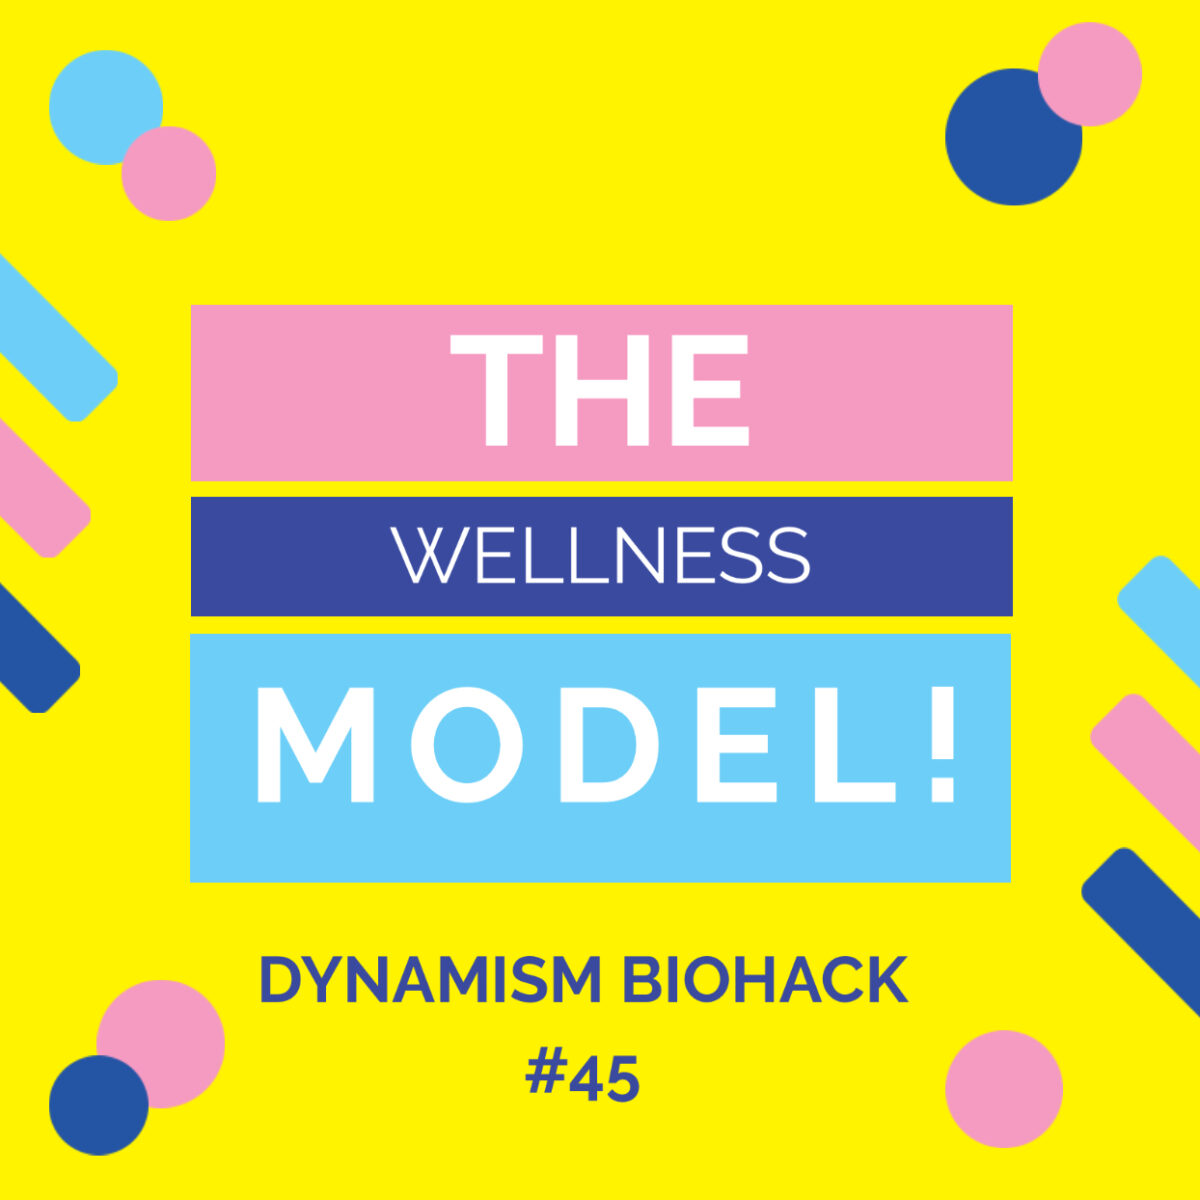 #45: The Wellness Model